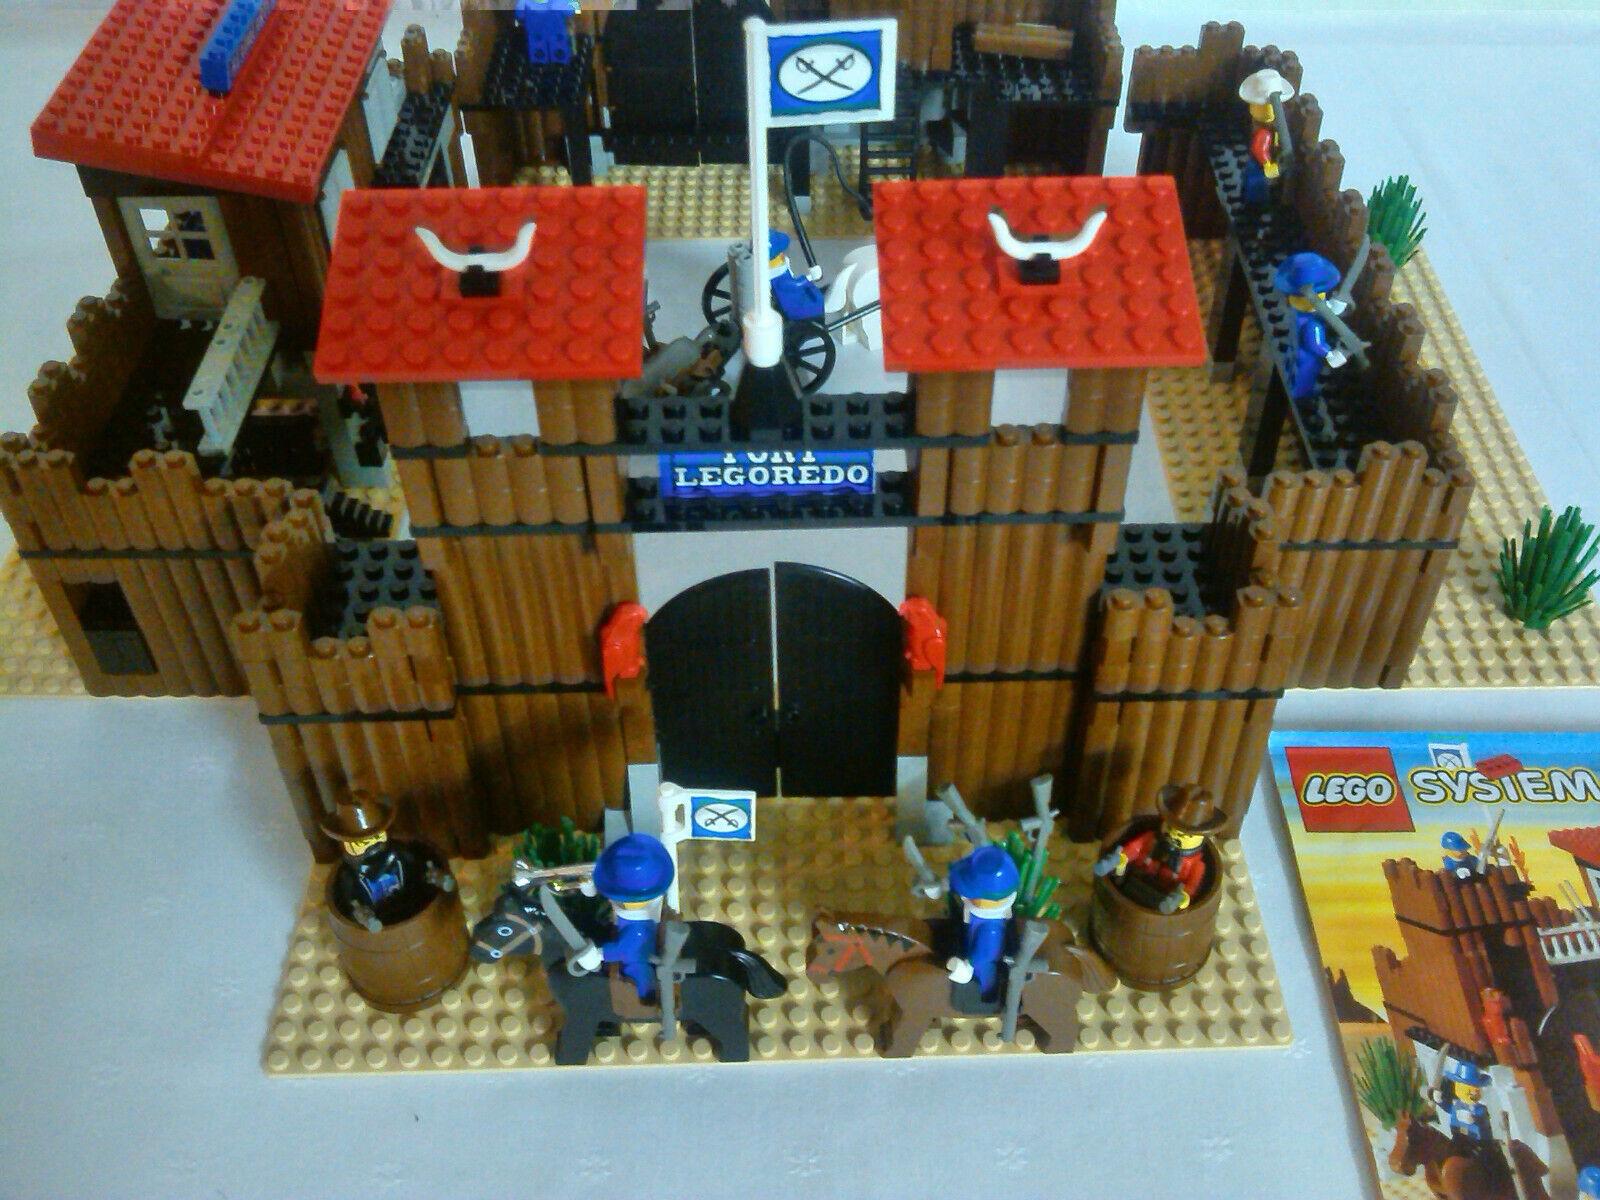 Lego 6769 Western  Fort Legorugeo 100% komplett mit OBA Anleitung Kavallerie Burg  livraison et retours gratuits